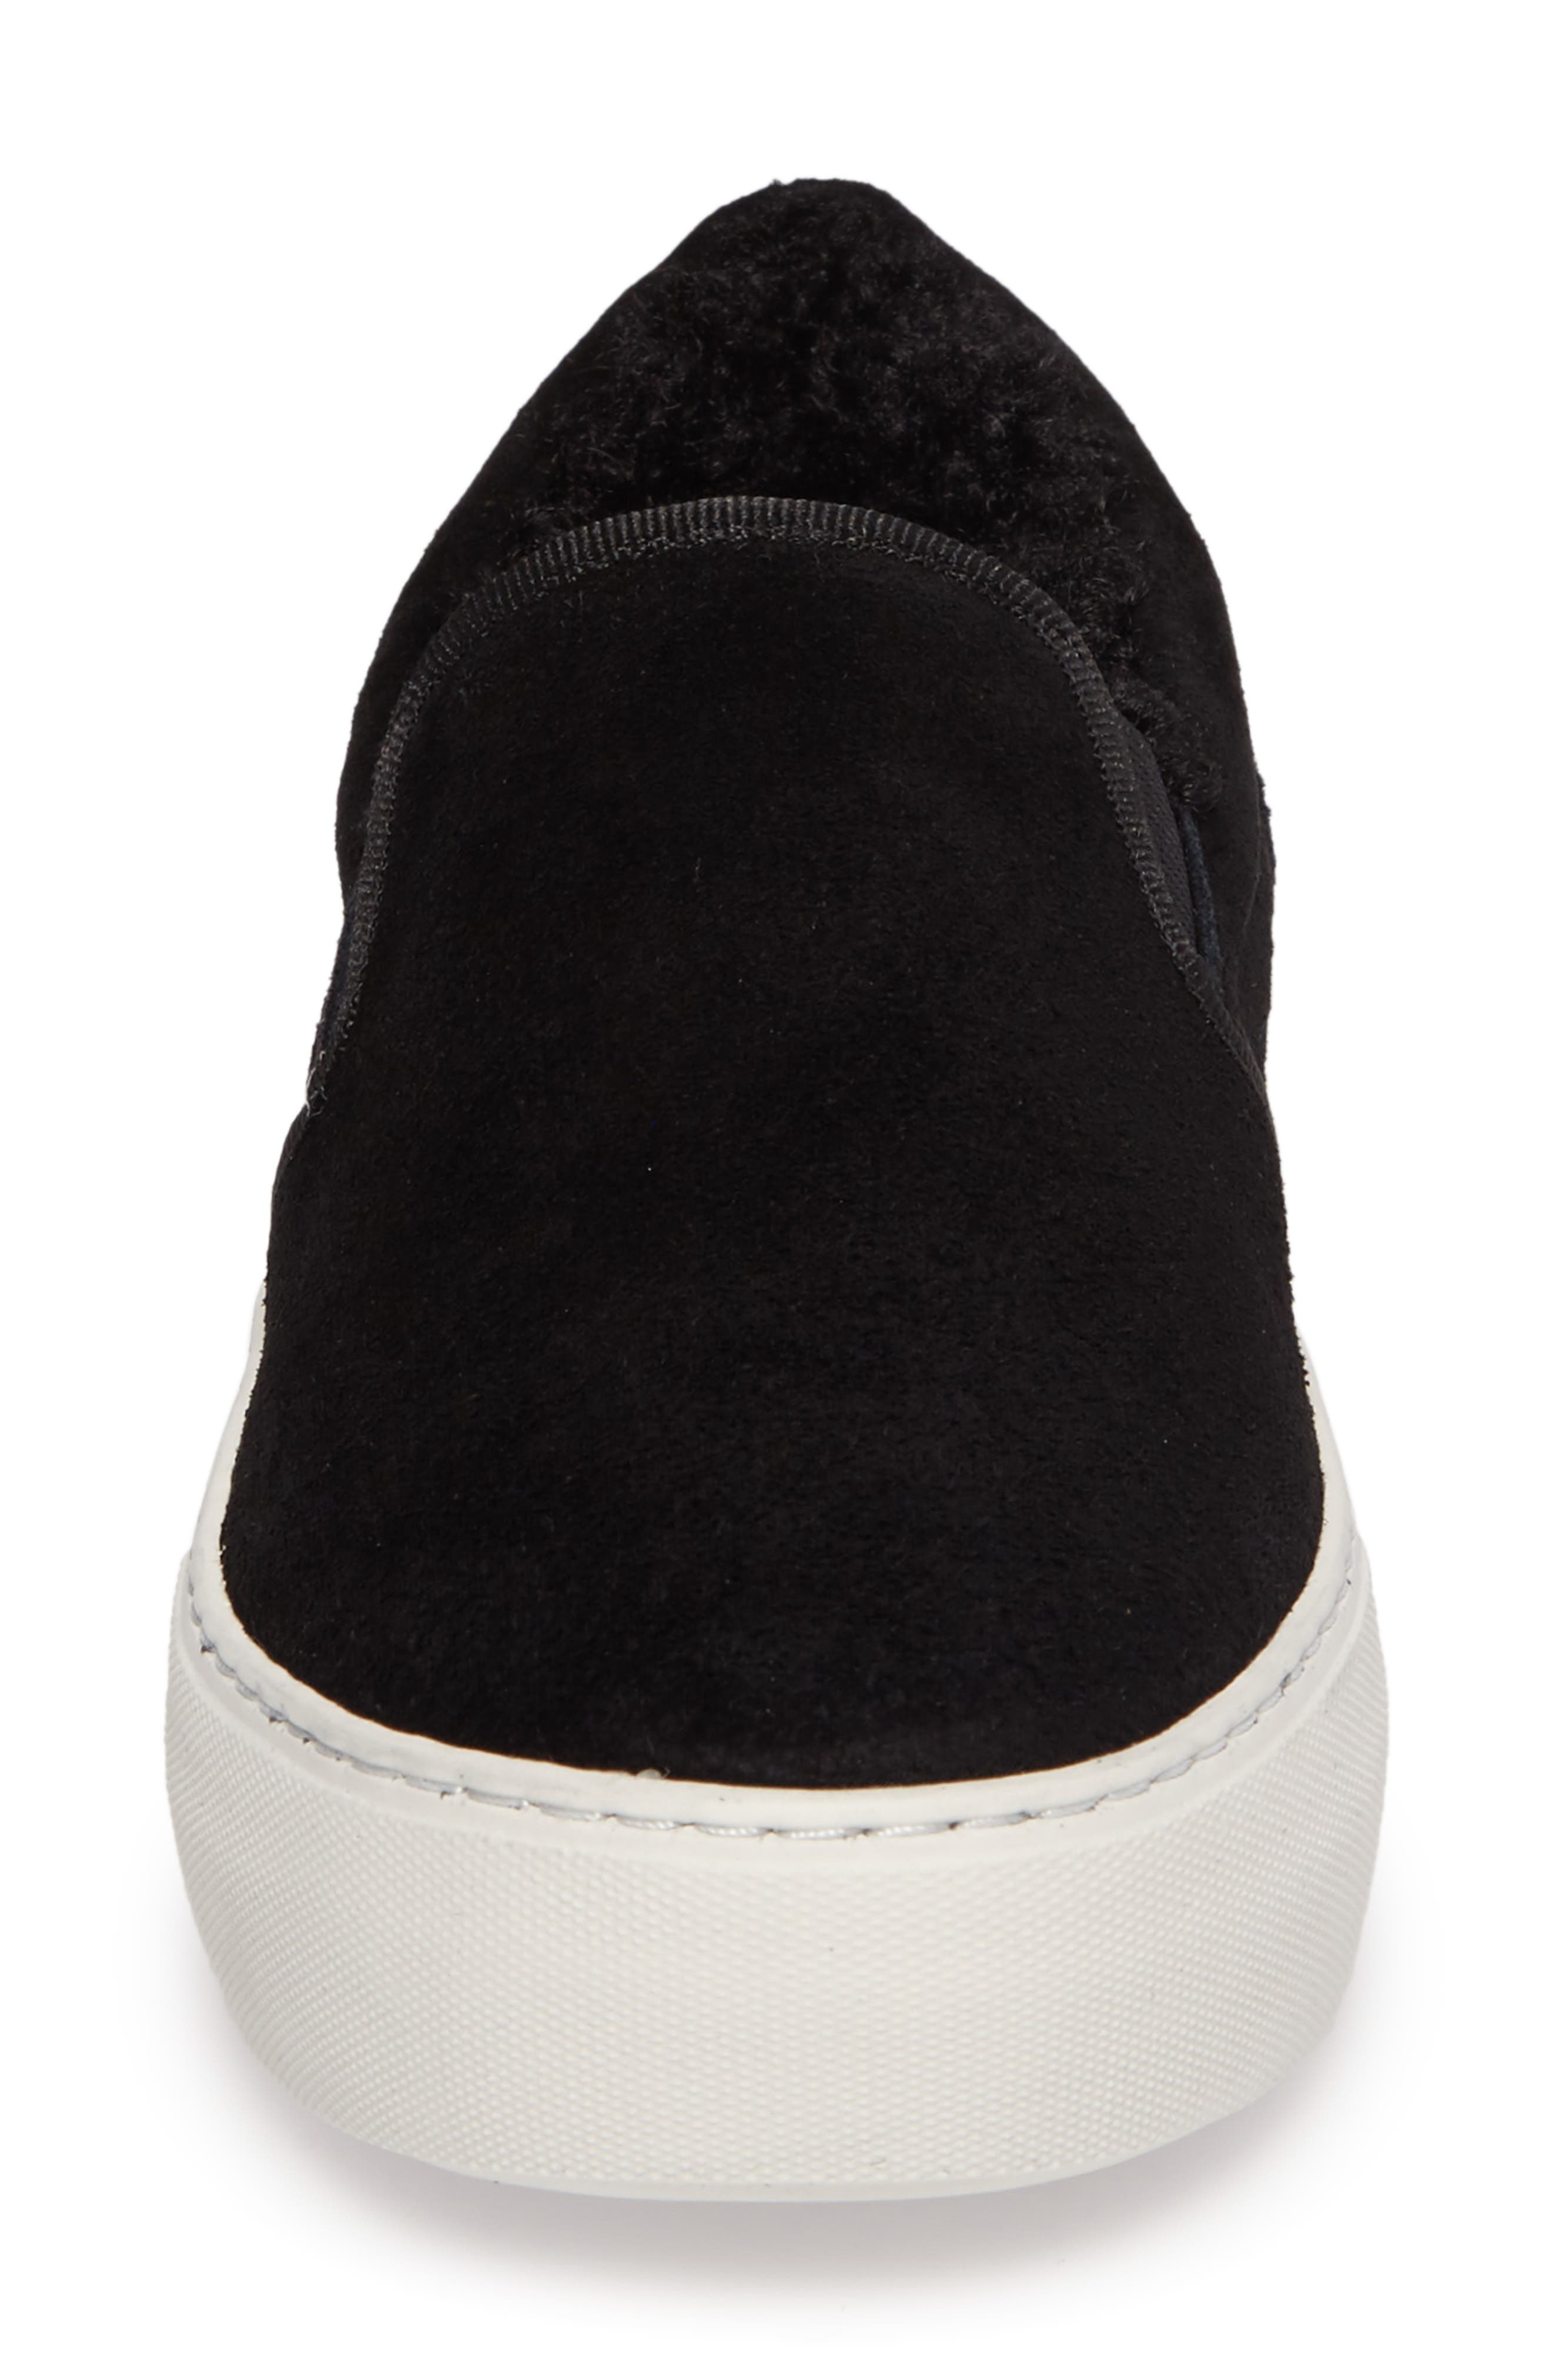 Arpel Faux Fur Lined Slip-On Sneaker,                             Alternate thumbnail 4, color,                             Black Suede